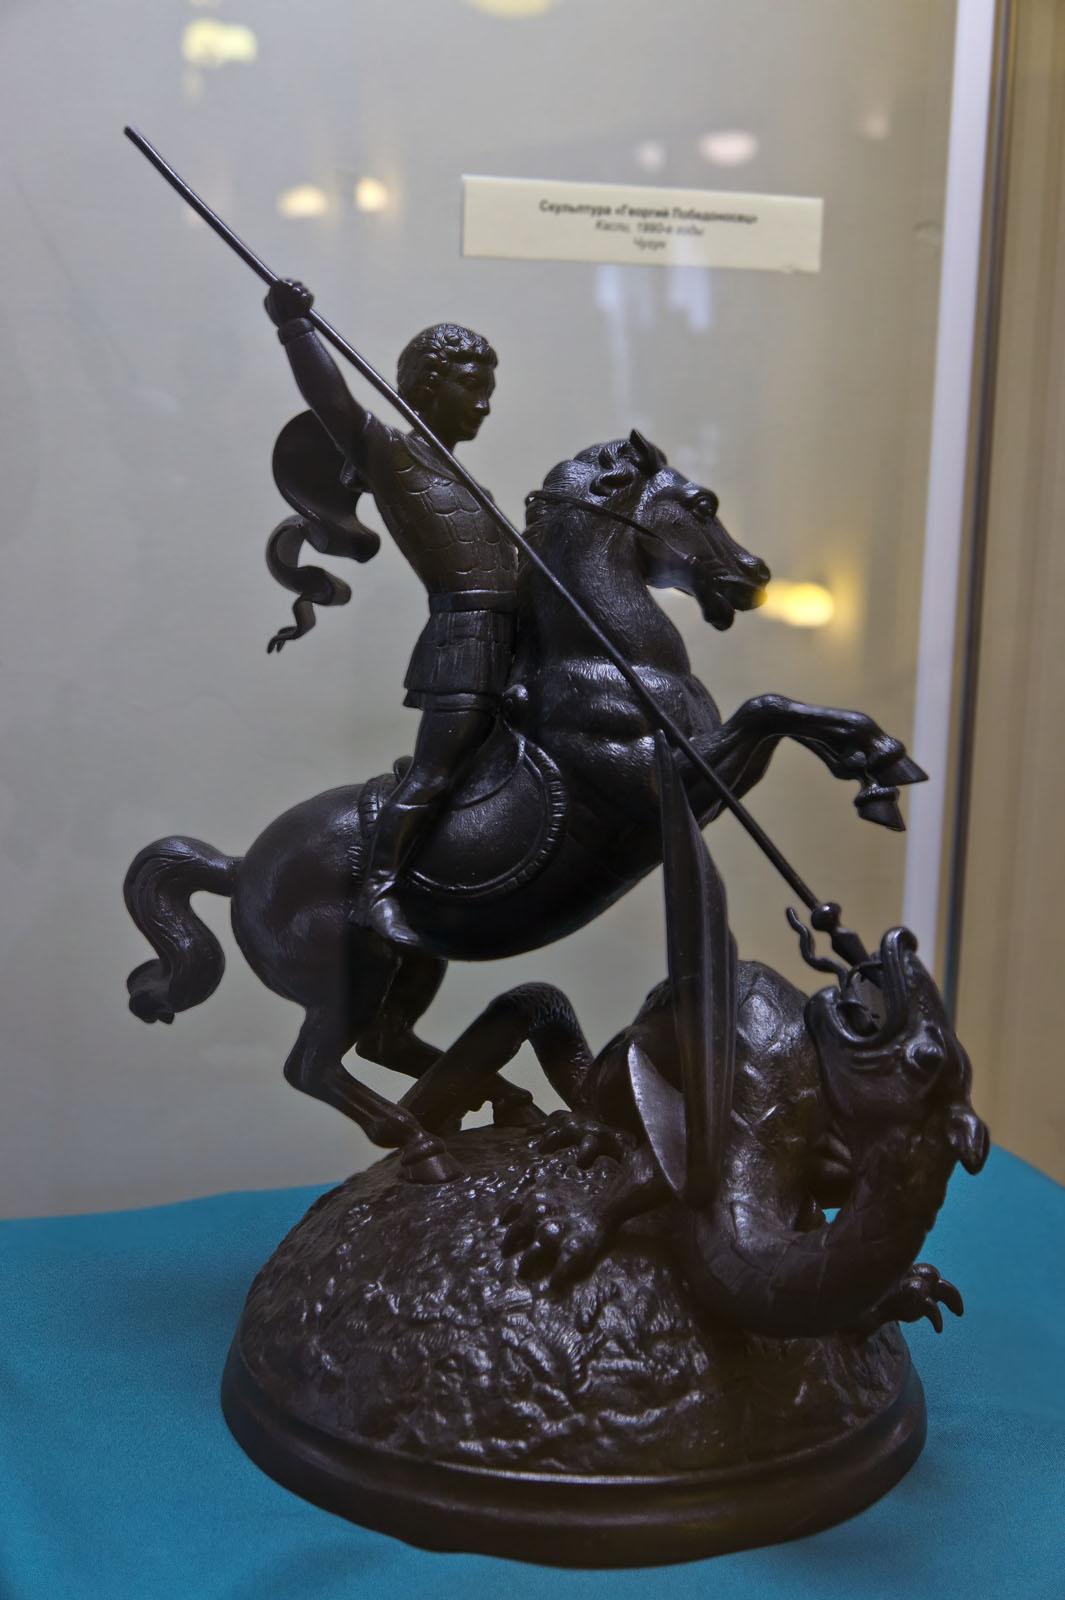 Фото №80059. Скульптура ''Георгий Победоносец''. 1990-е гг.